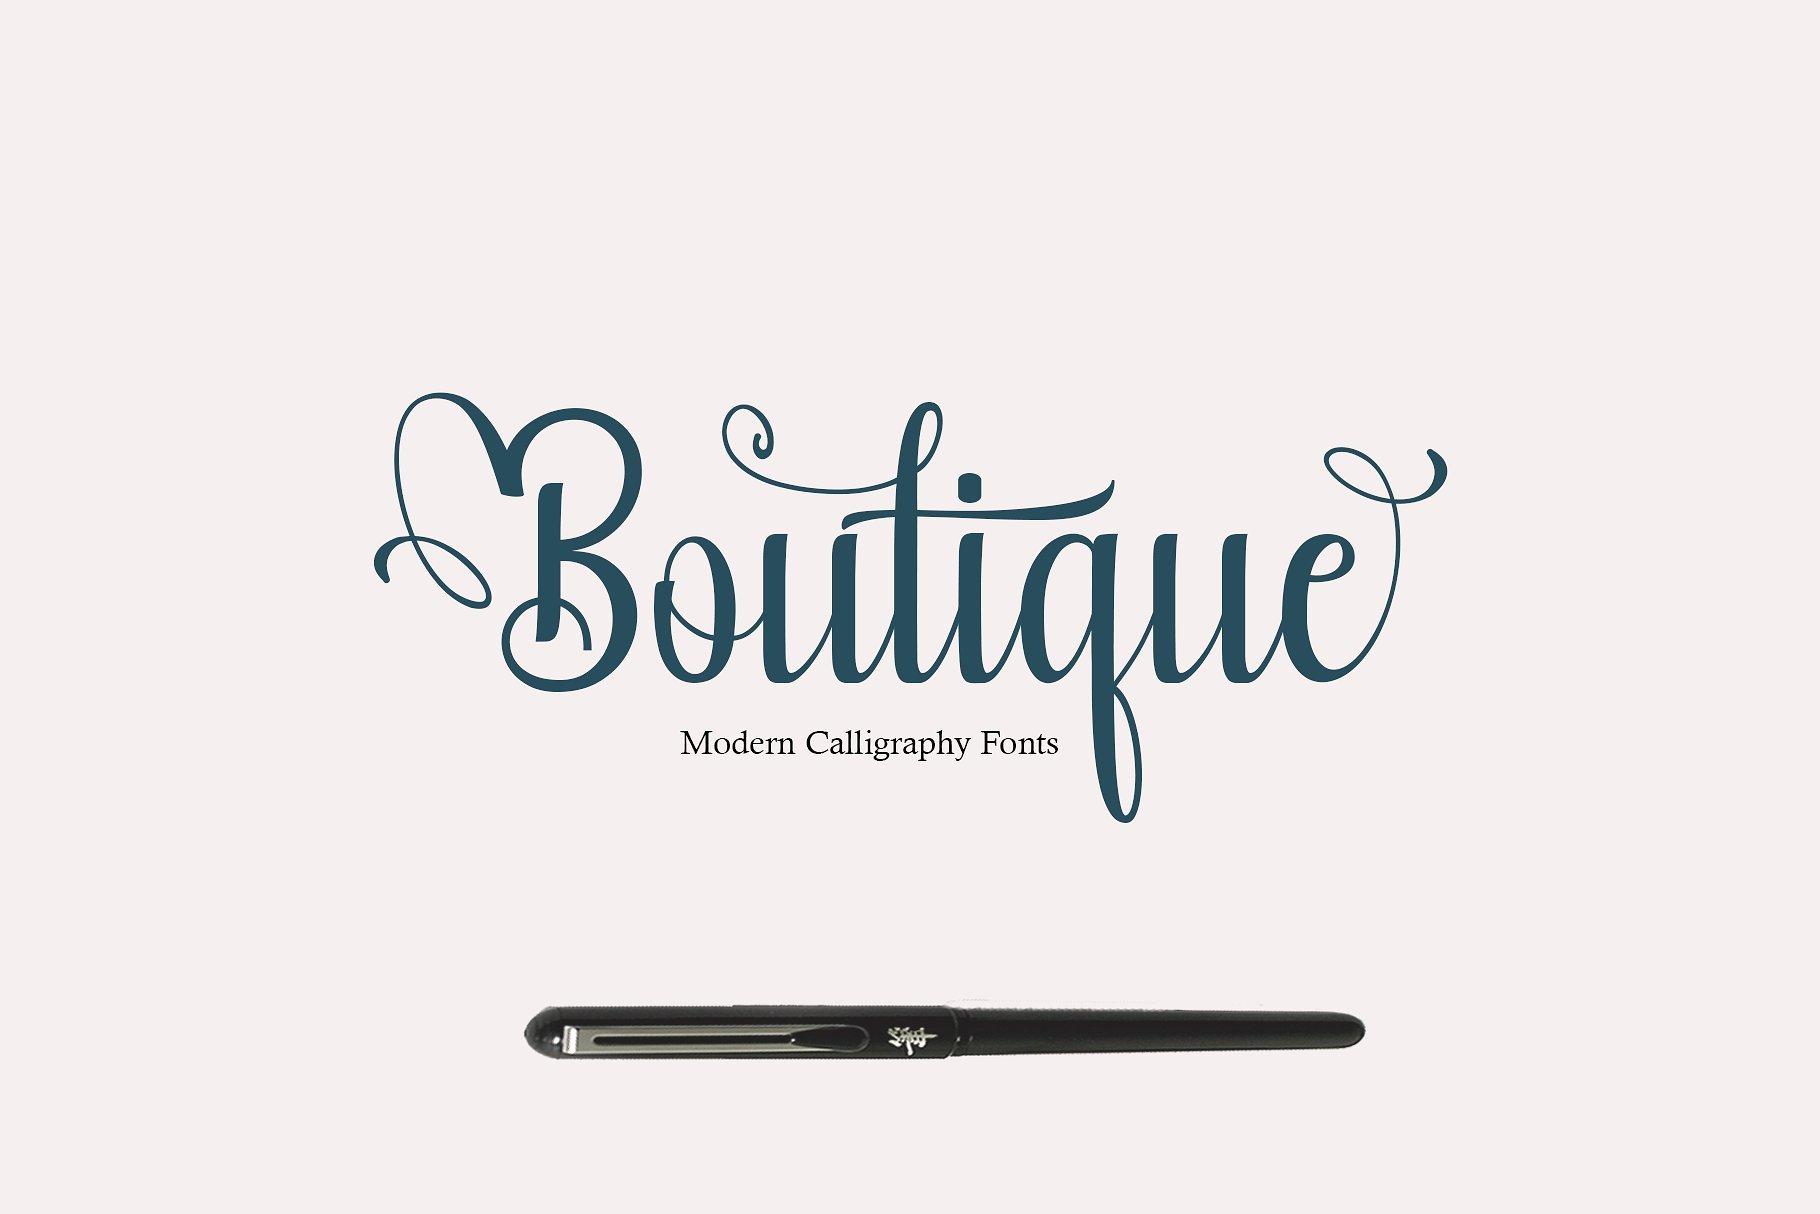 https://fontclarity.com/wp-content/uploads/2019/09/boutique-calligraphy-font-download-0.jpg Free Download